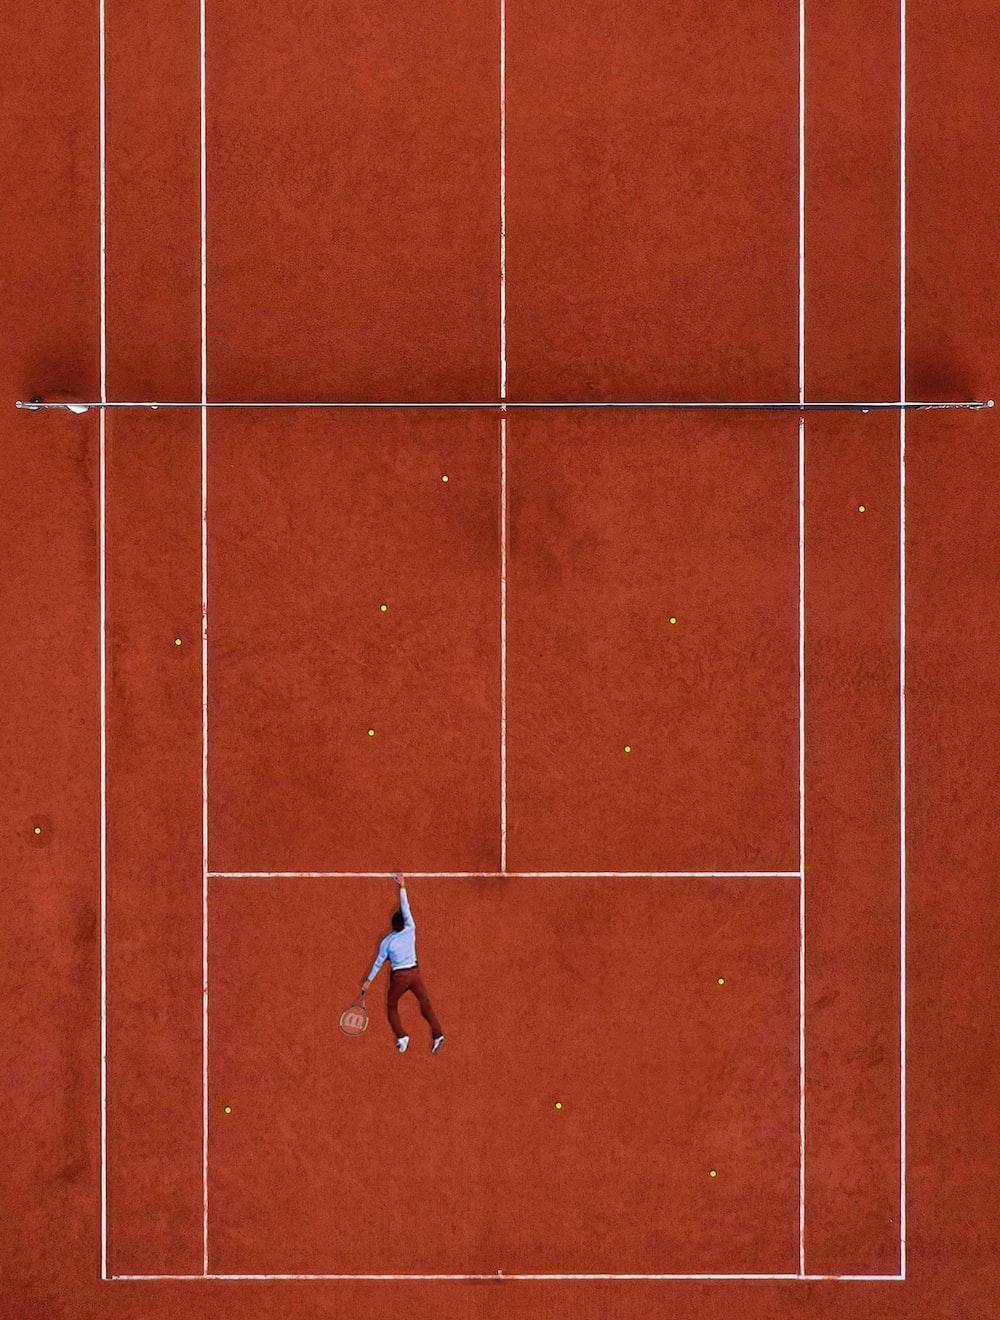 man lying on tennis field